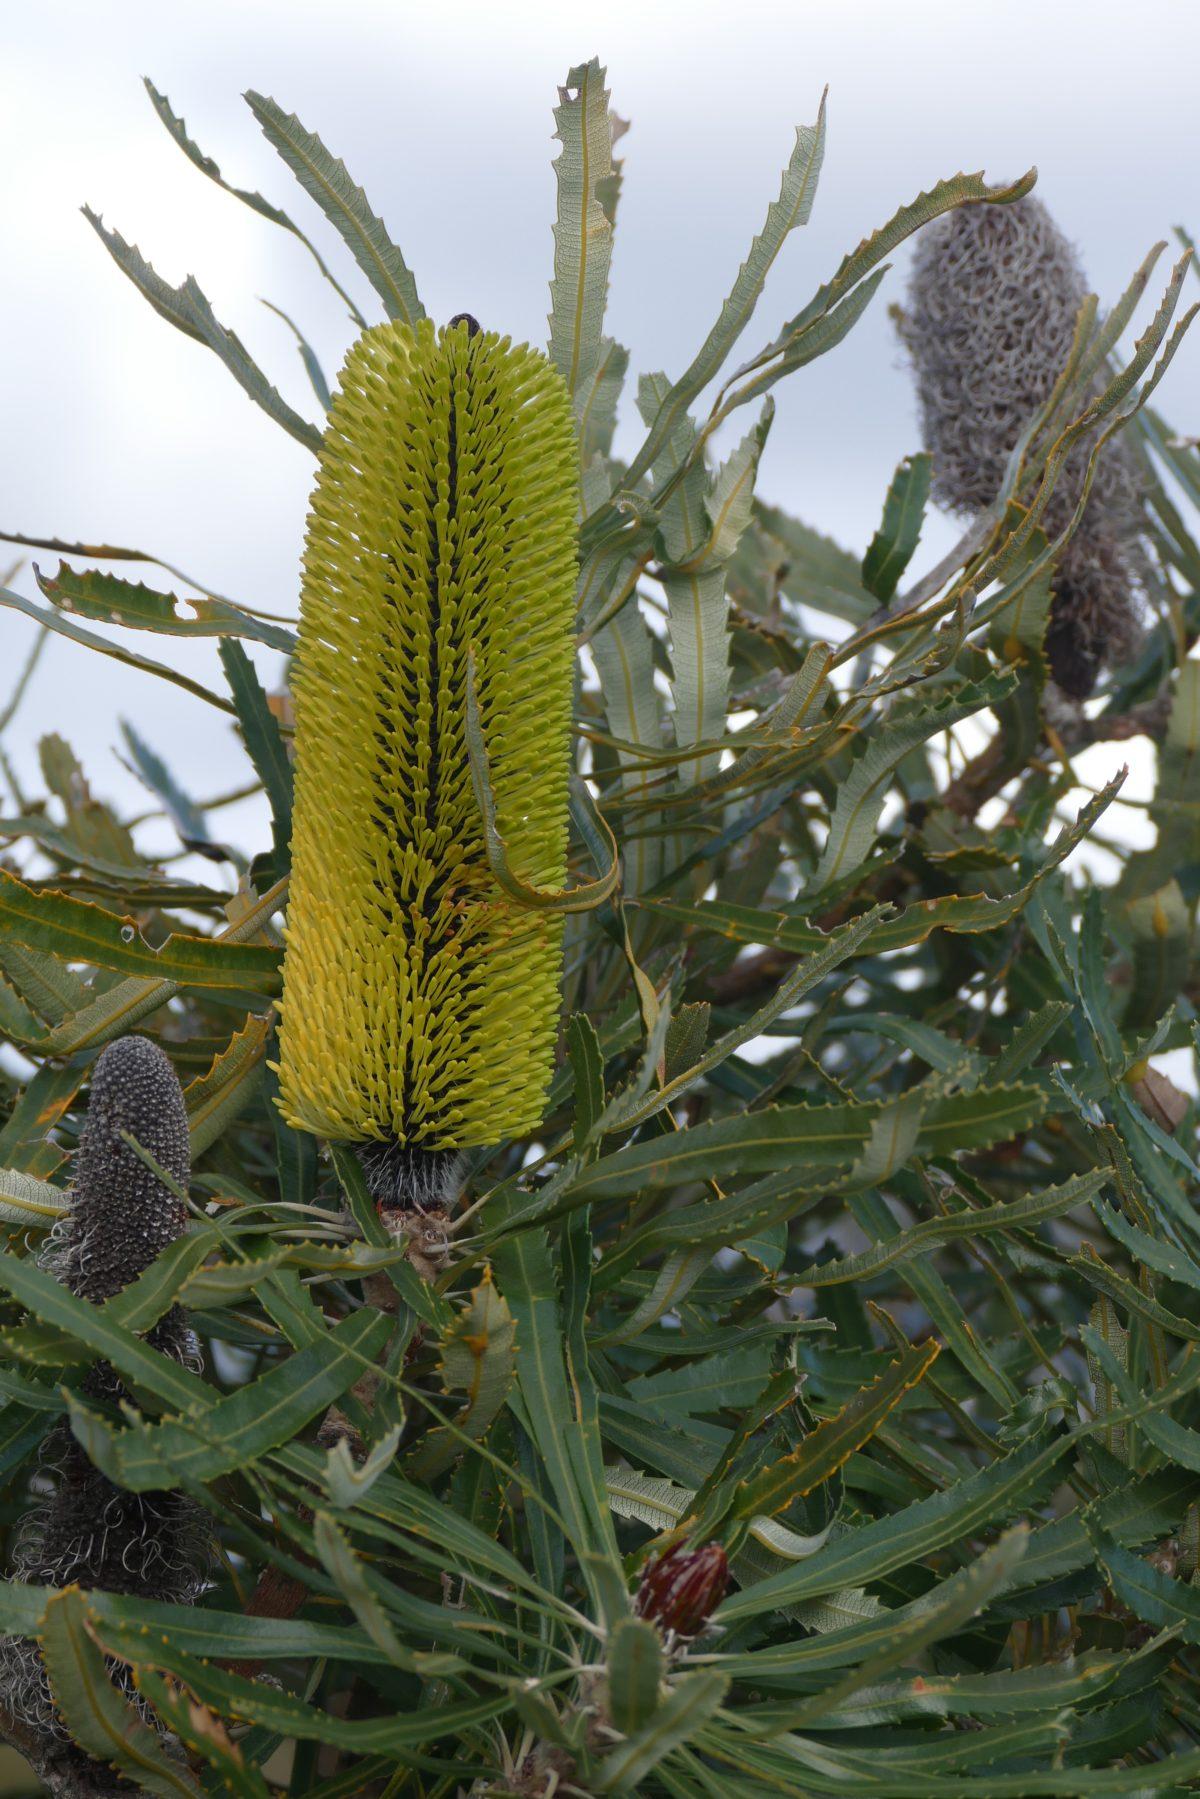 Banksia, Waychinicup, Spring 2016. All photos copyright Doug Spencer.